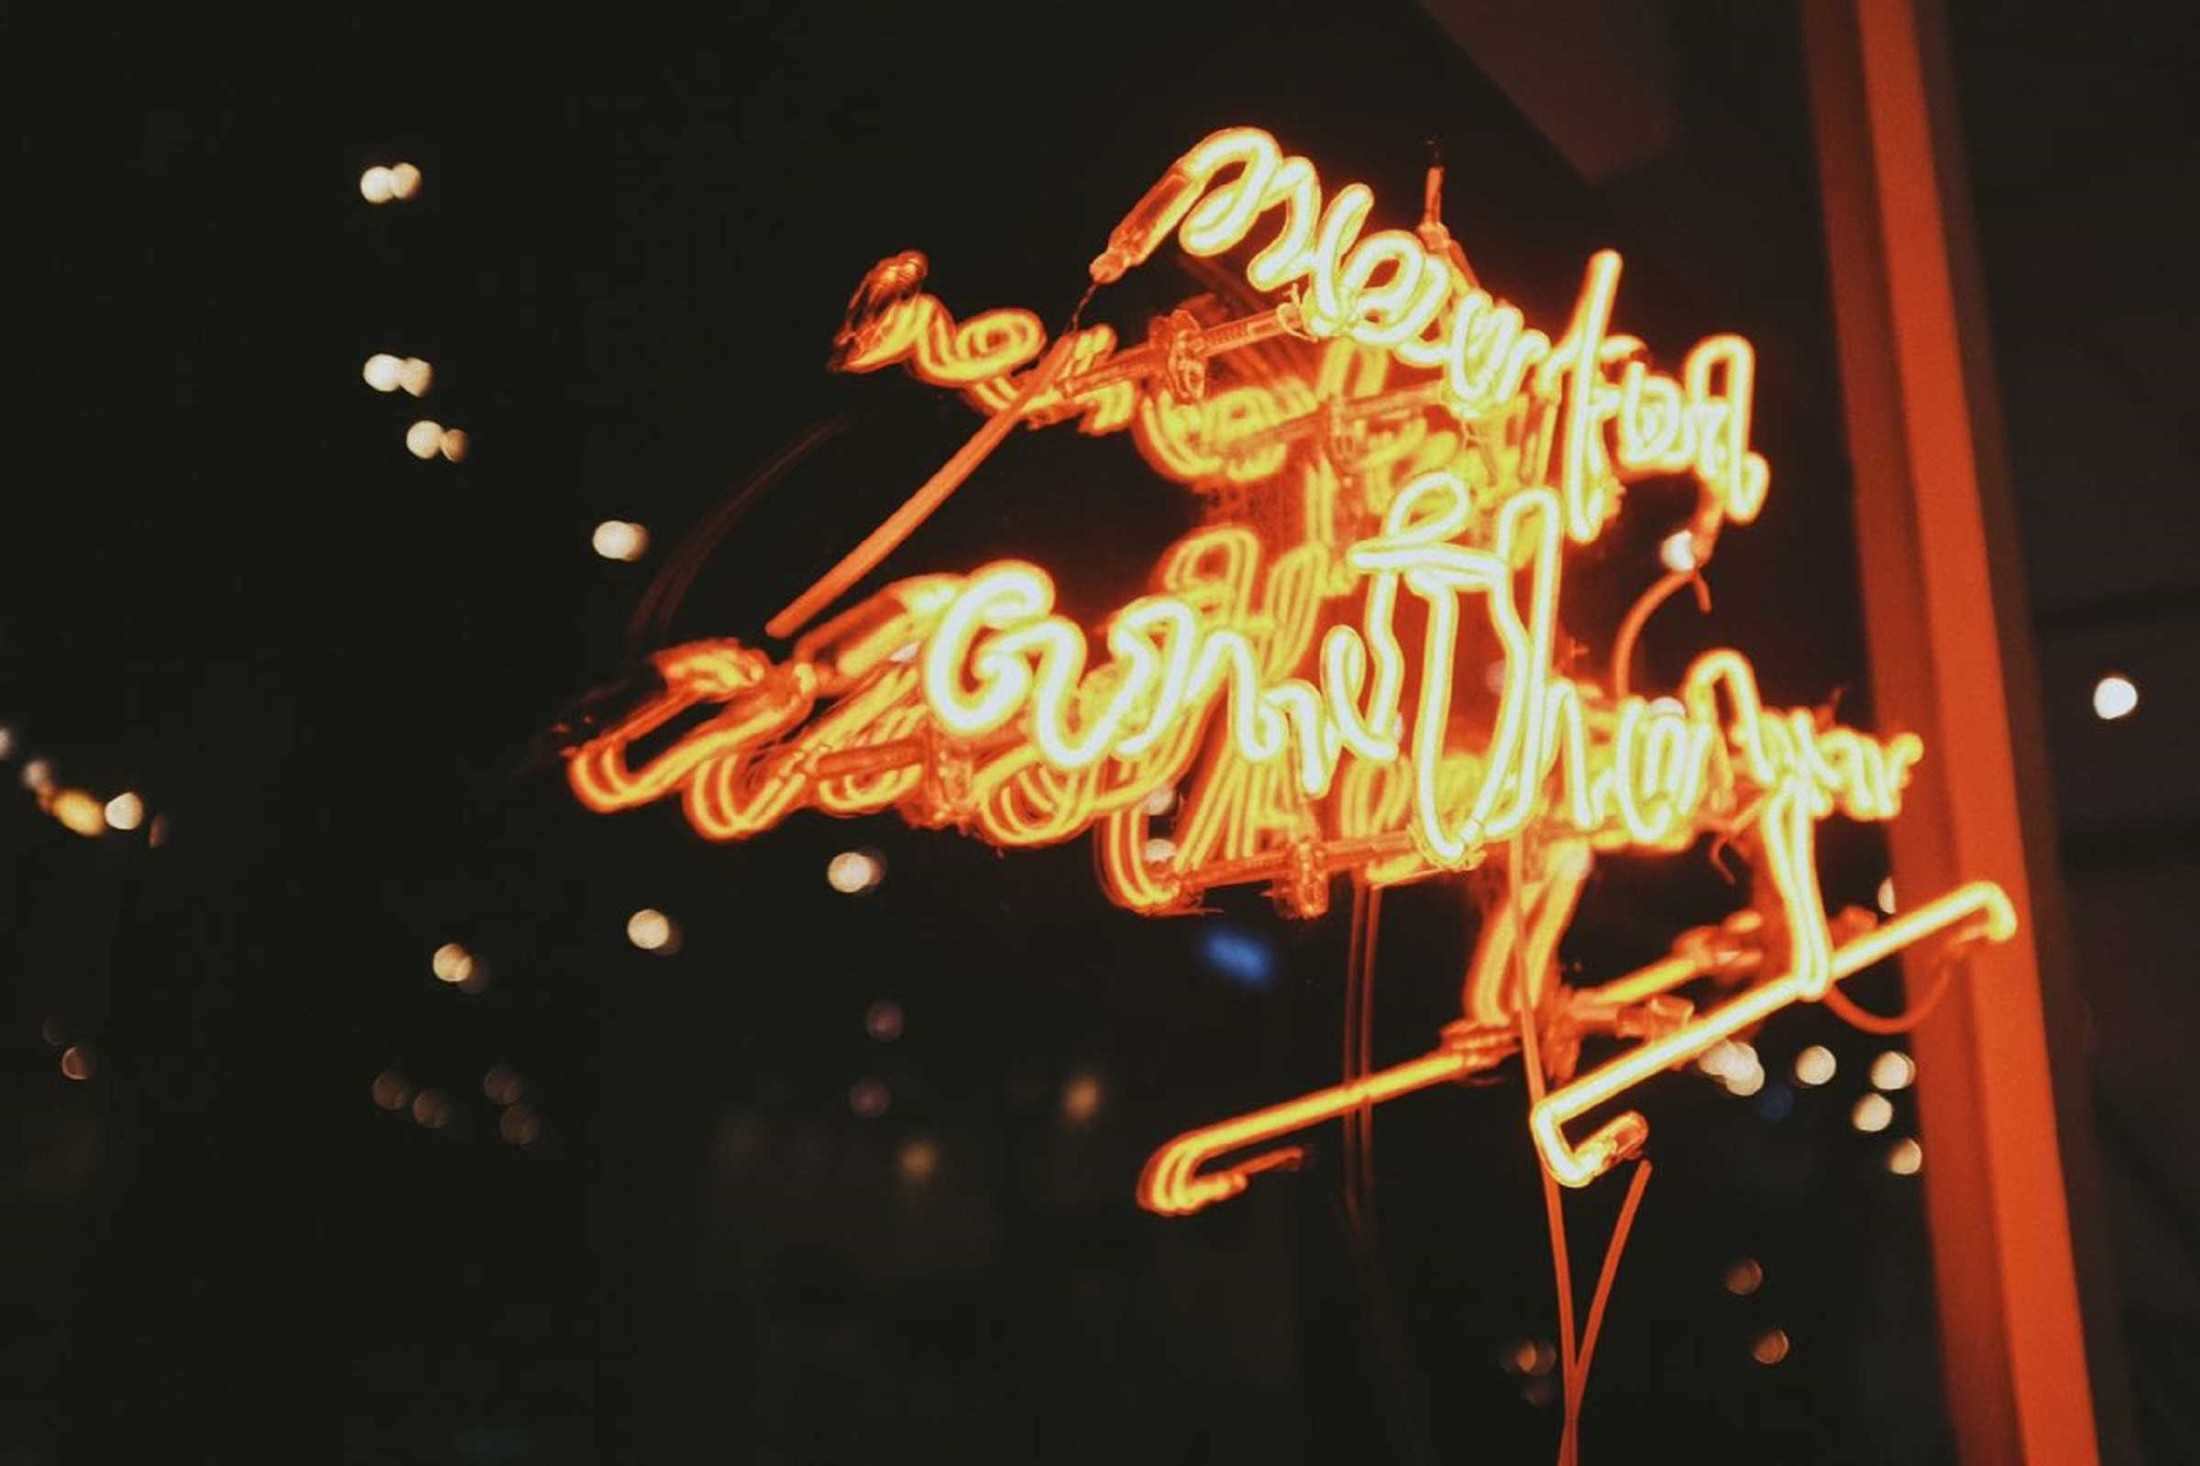 Arkara - Interior Contractor Atipattra Booth Jl. Bsd Grand Boulevard No.1, Pagedangan, Tangerang, Banten 15339, Indonesia Jl. Bsd Grand Boulevard No.1, Pagedangan, Tangerang, Banten 15339, Indonesia Arcon-Interior-Furniture-Contractor-Atipattra-Booth  69891